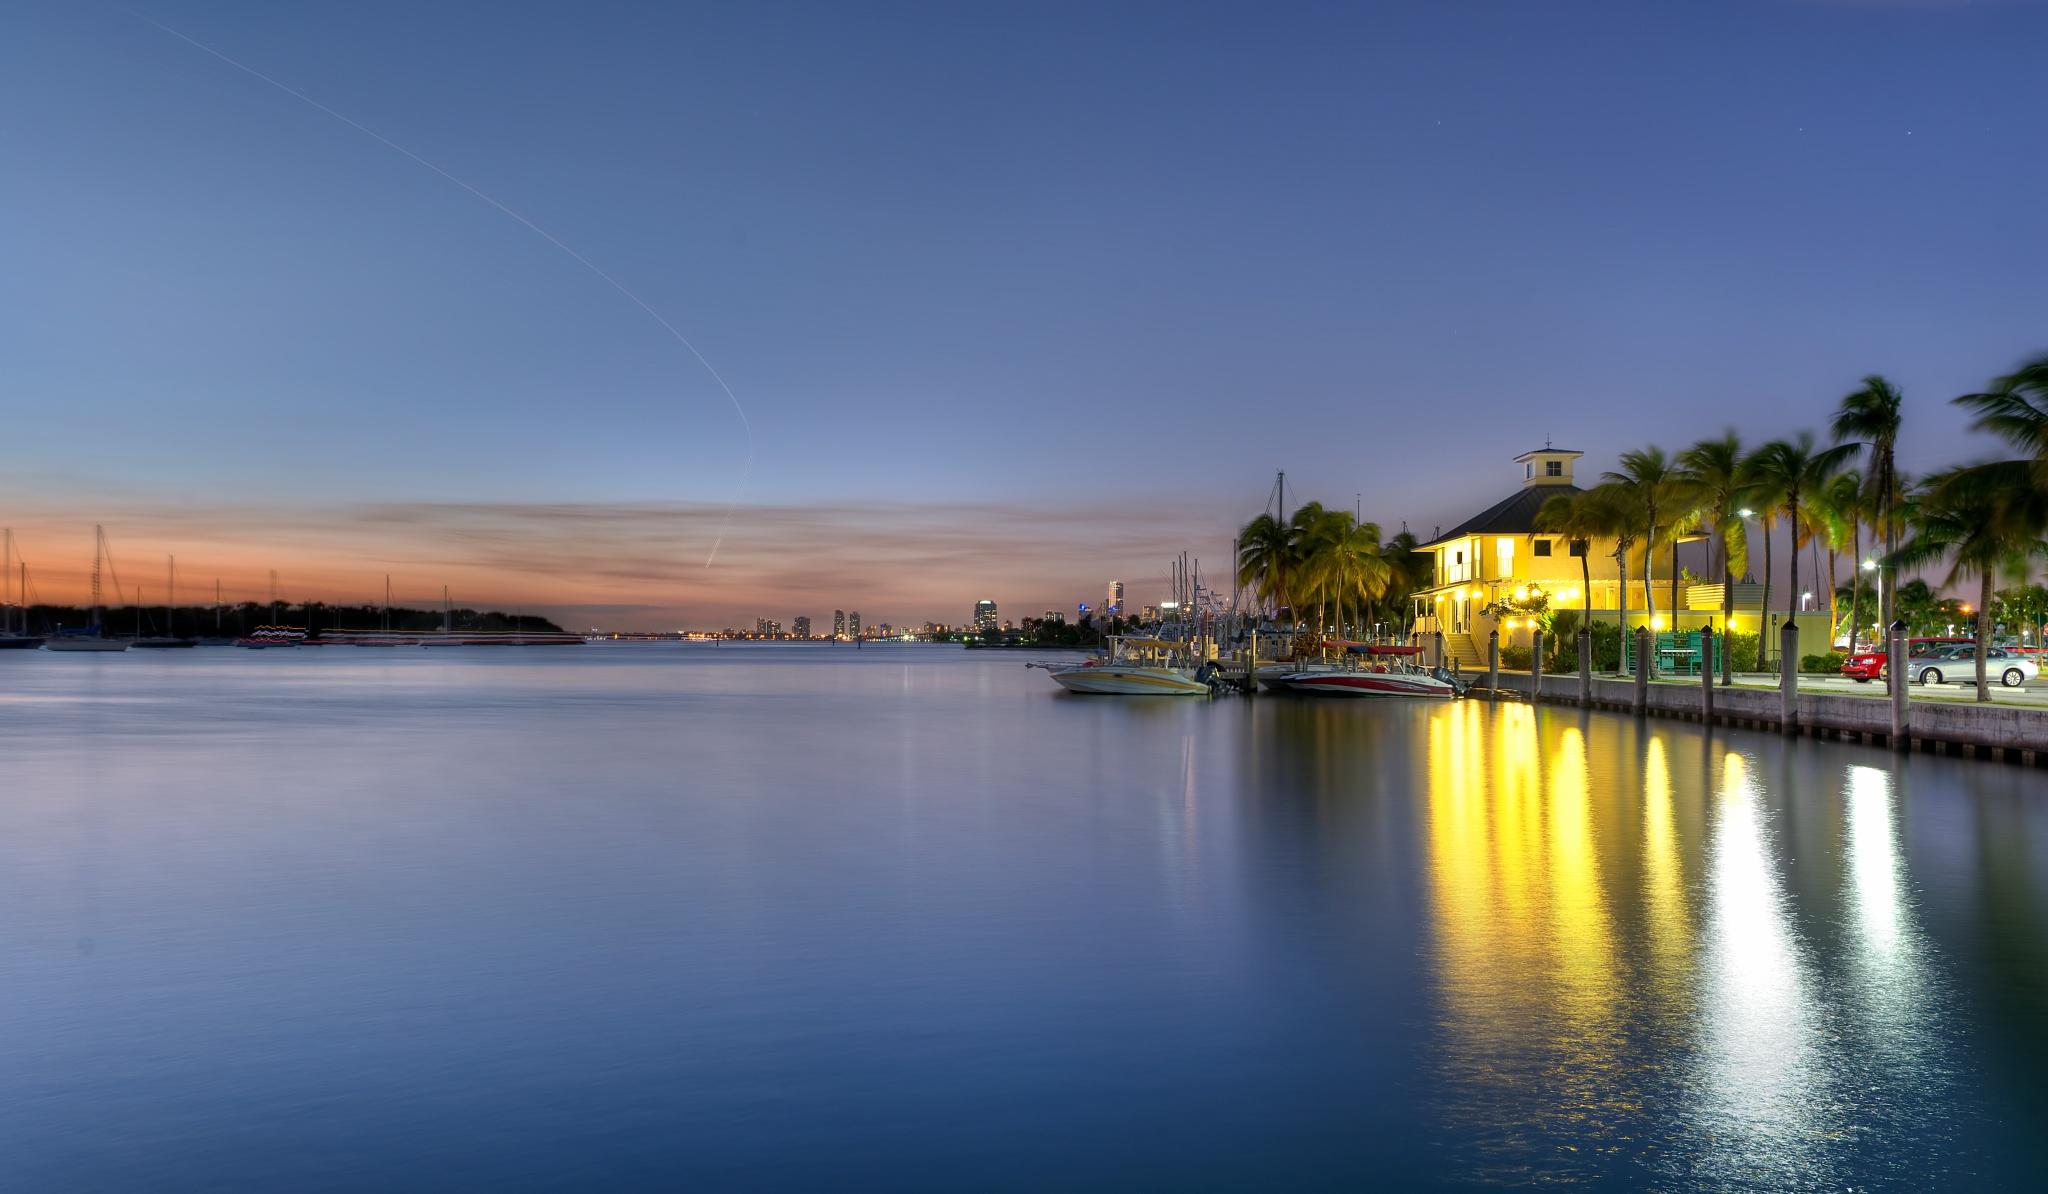 Winter in Florida... by aygita